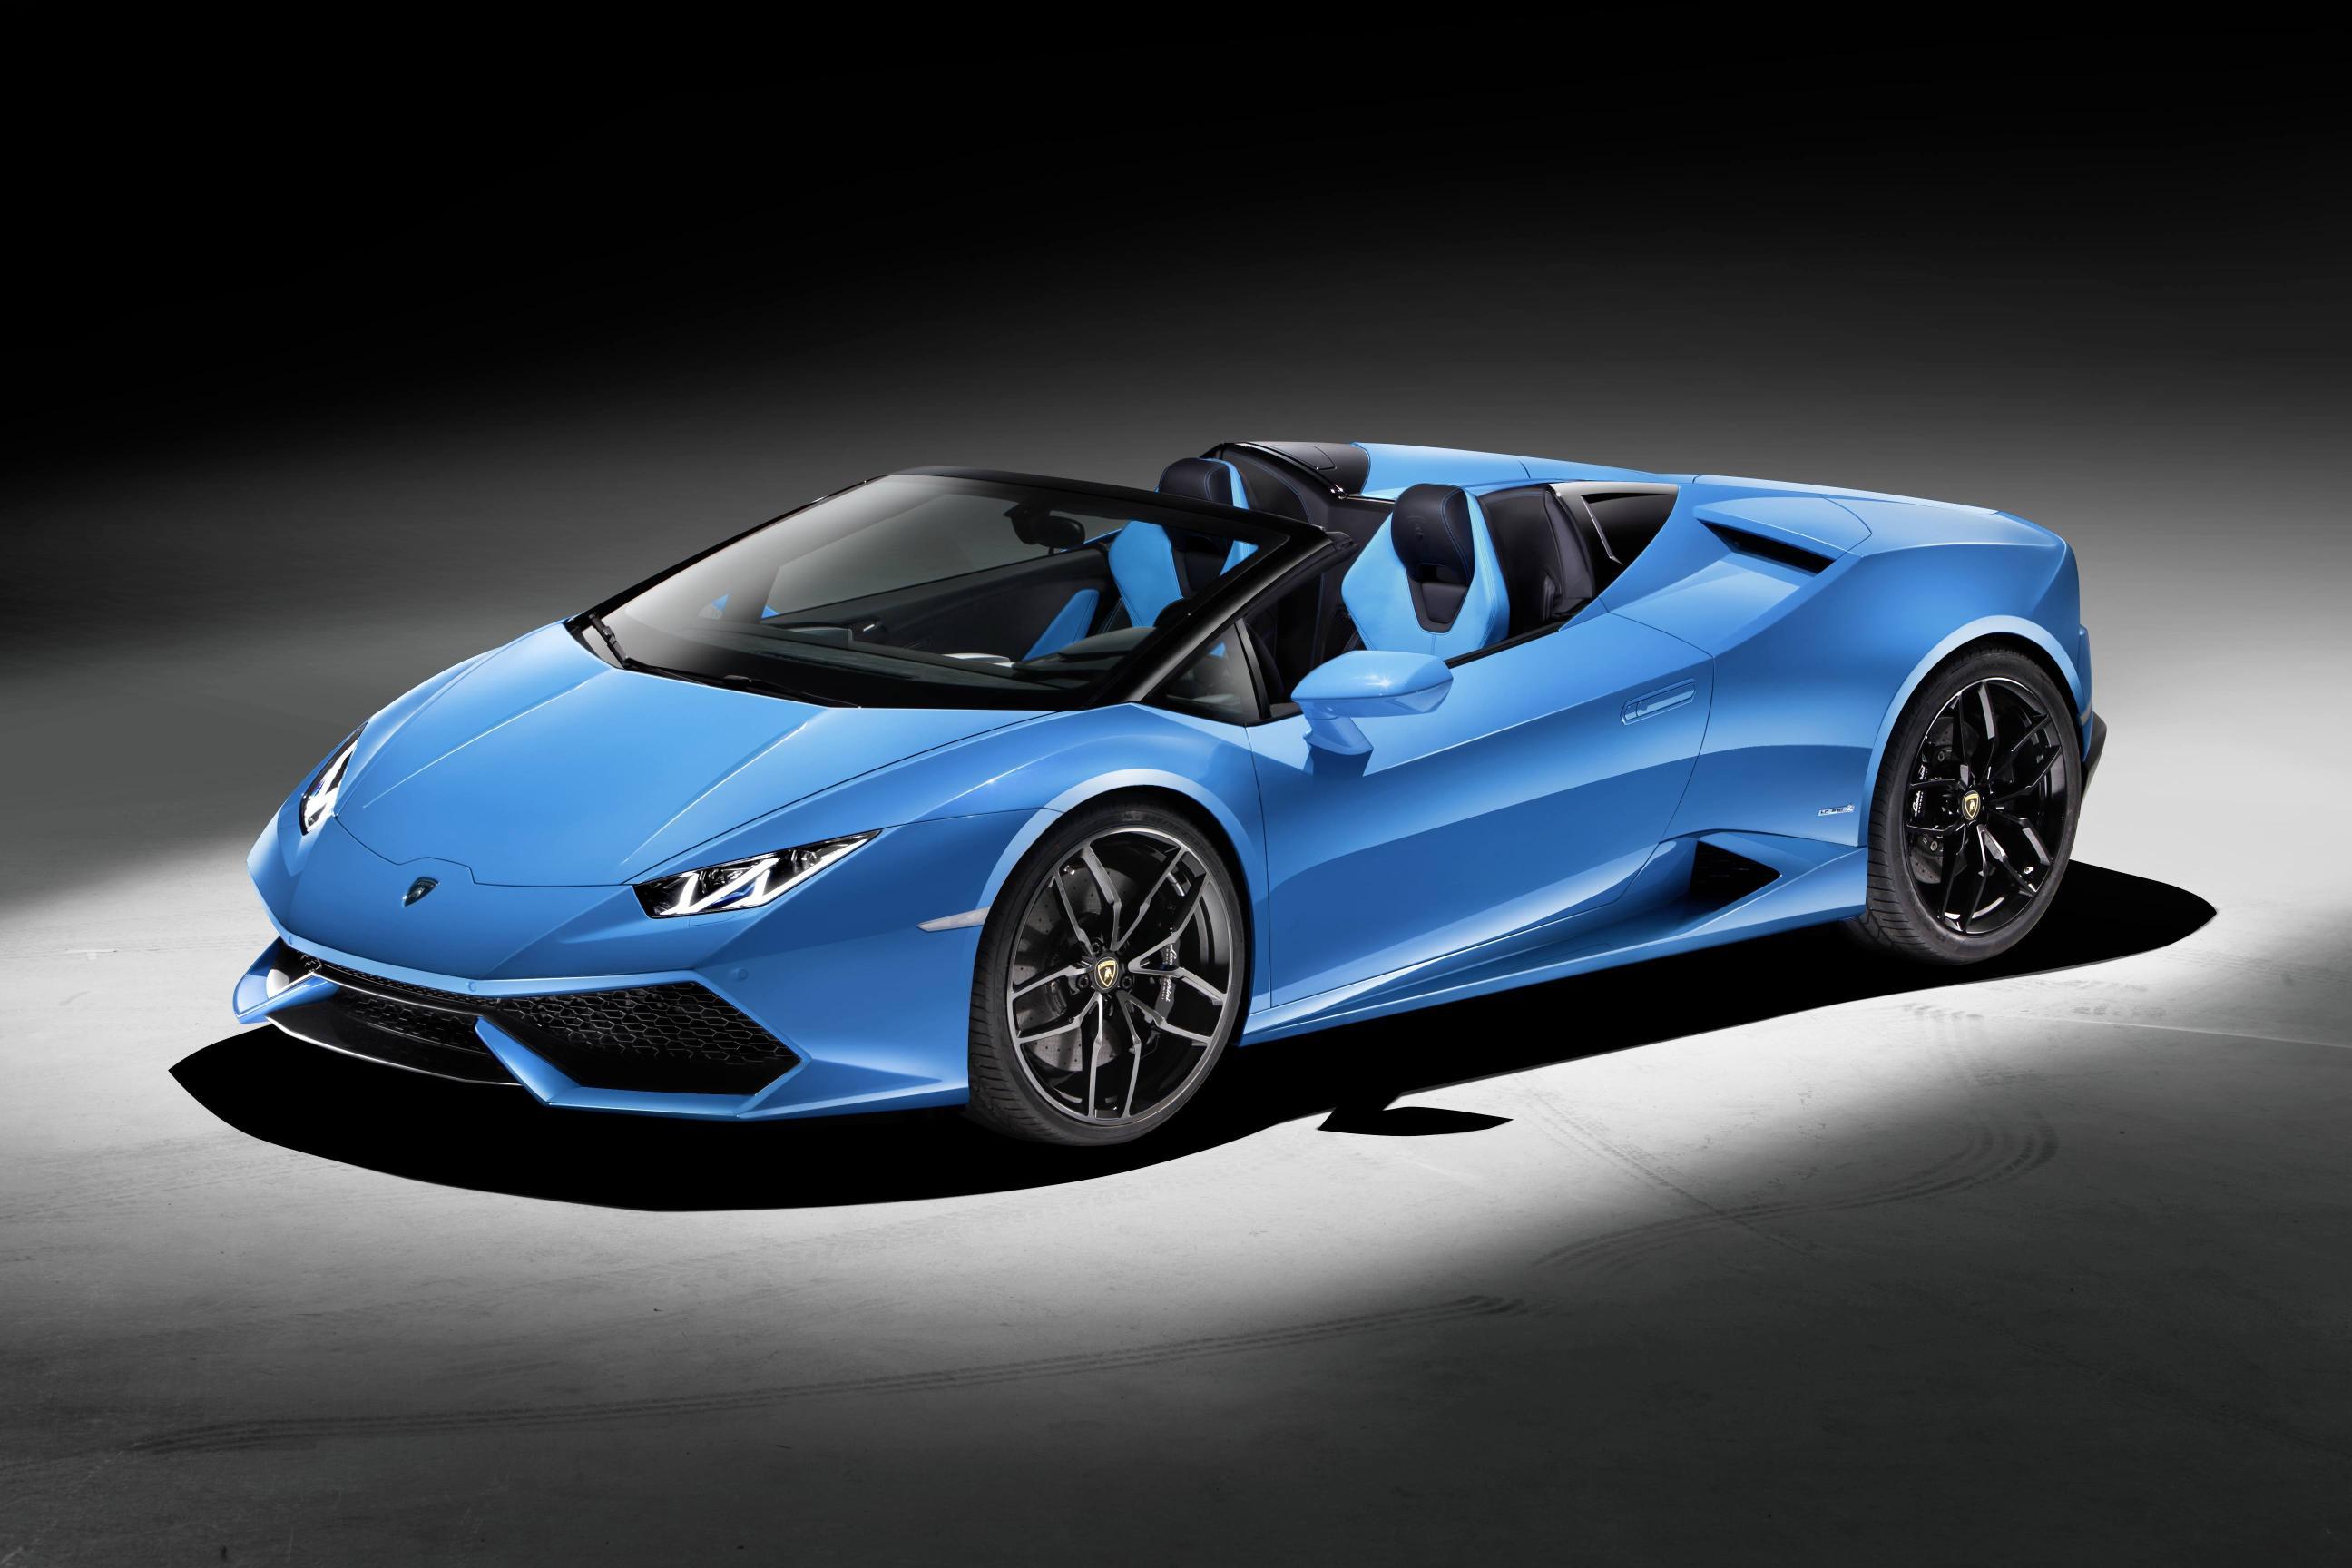 397822 Amazing 2015 Lamborghini Huracan Price Per Month Cars Trend